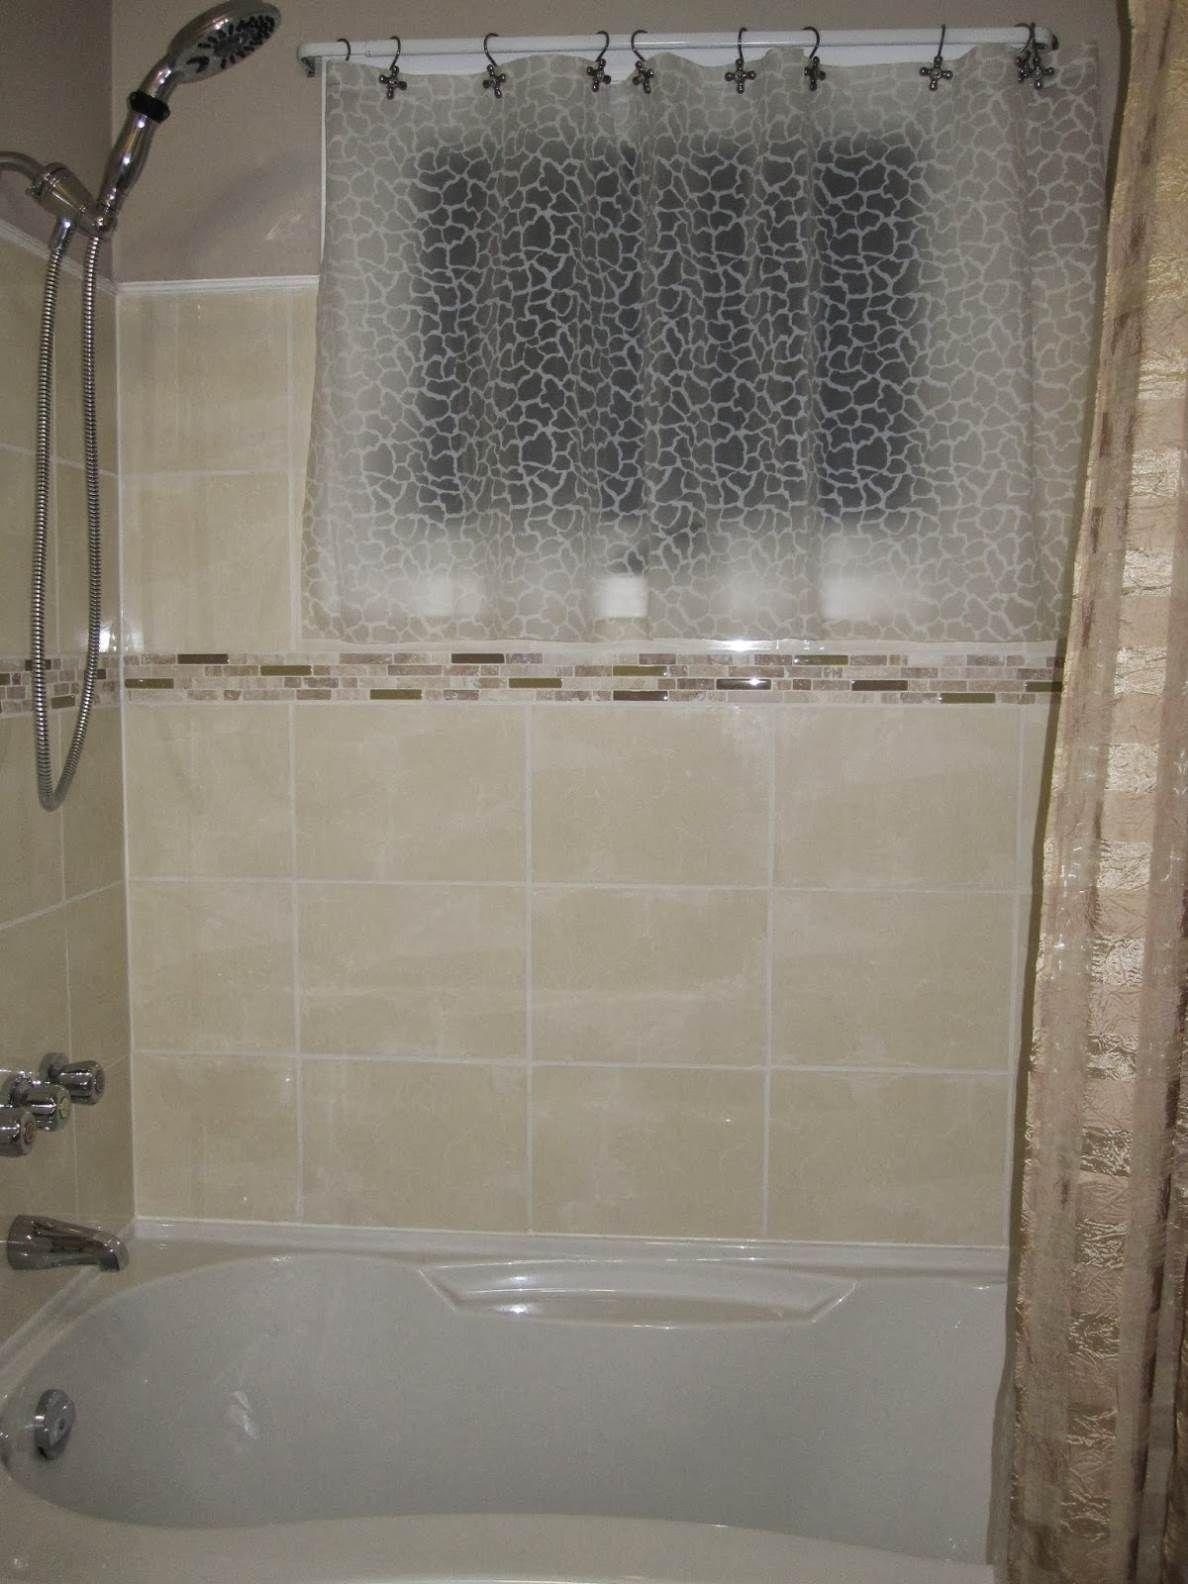 Waterproof Curtains For Shower Windows Window In Shower